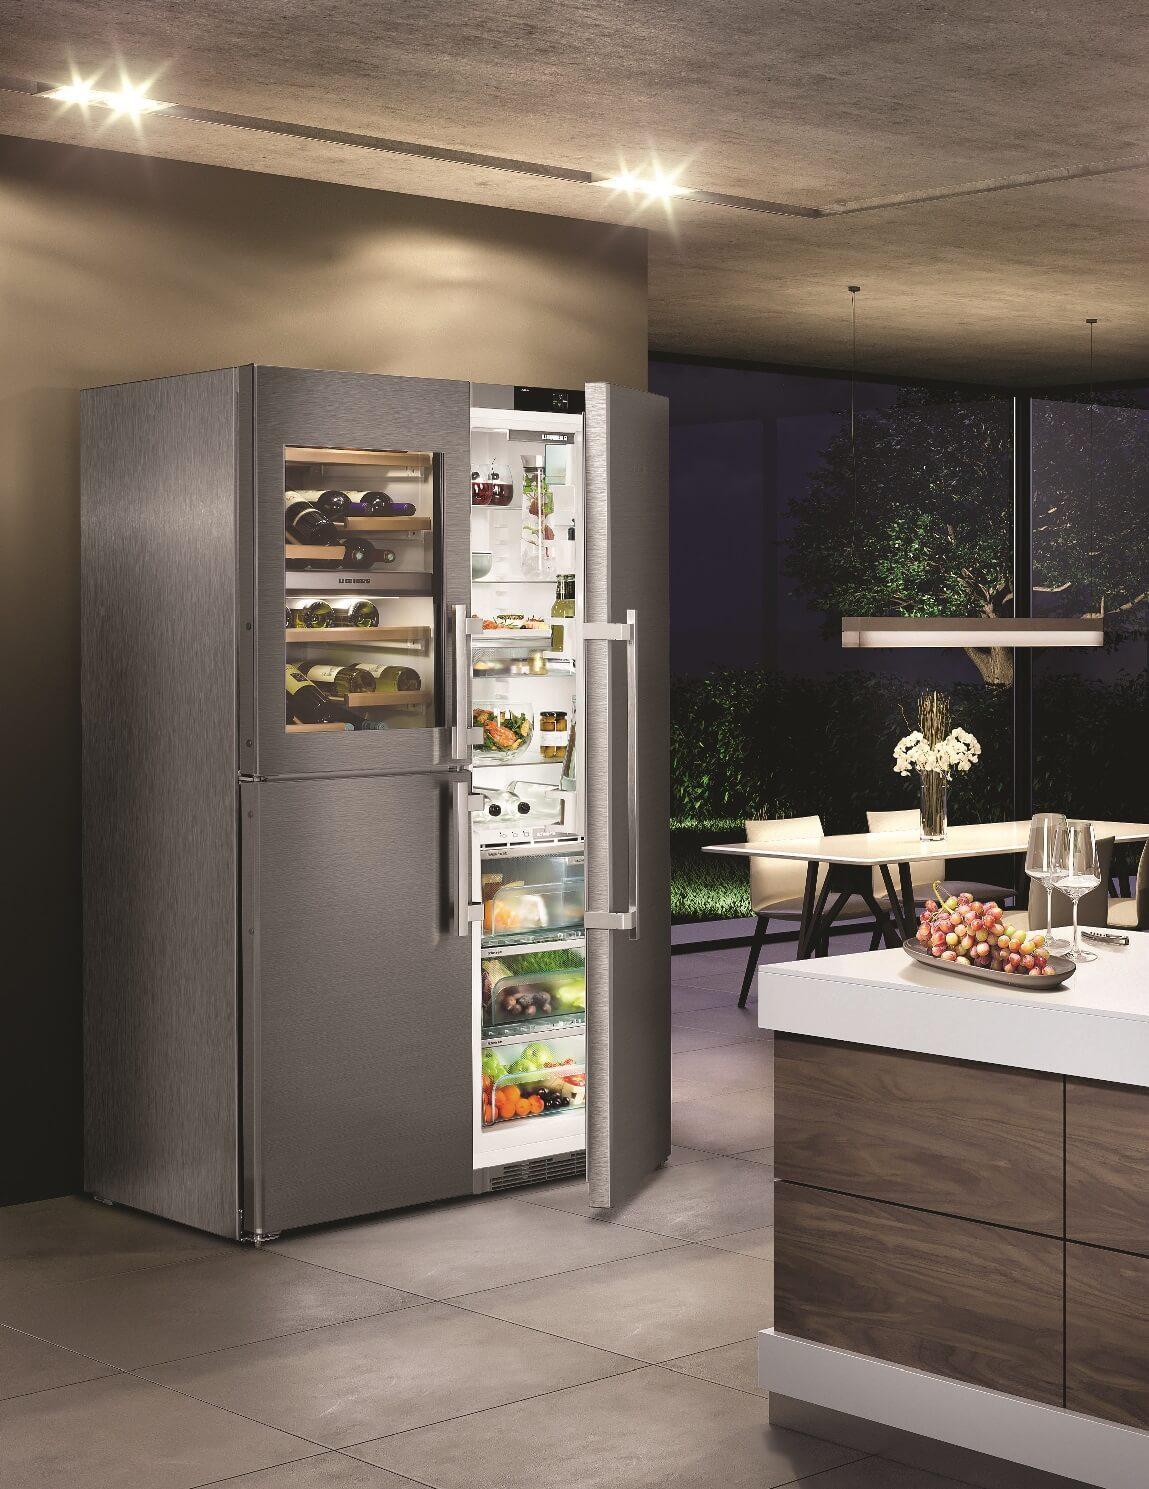 купить Side-by-Side холодильник Liebherr SBSes 8486 Украина фото 8